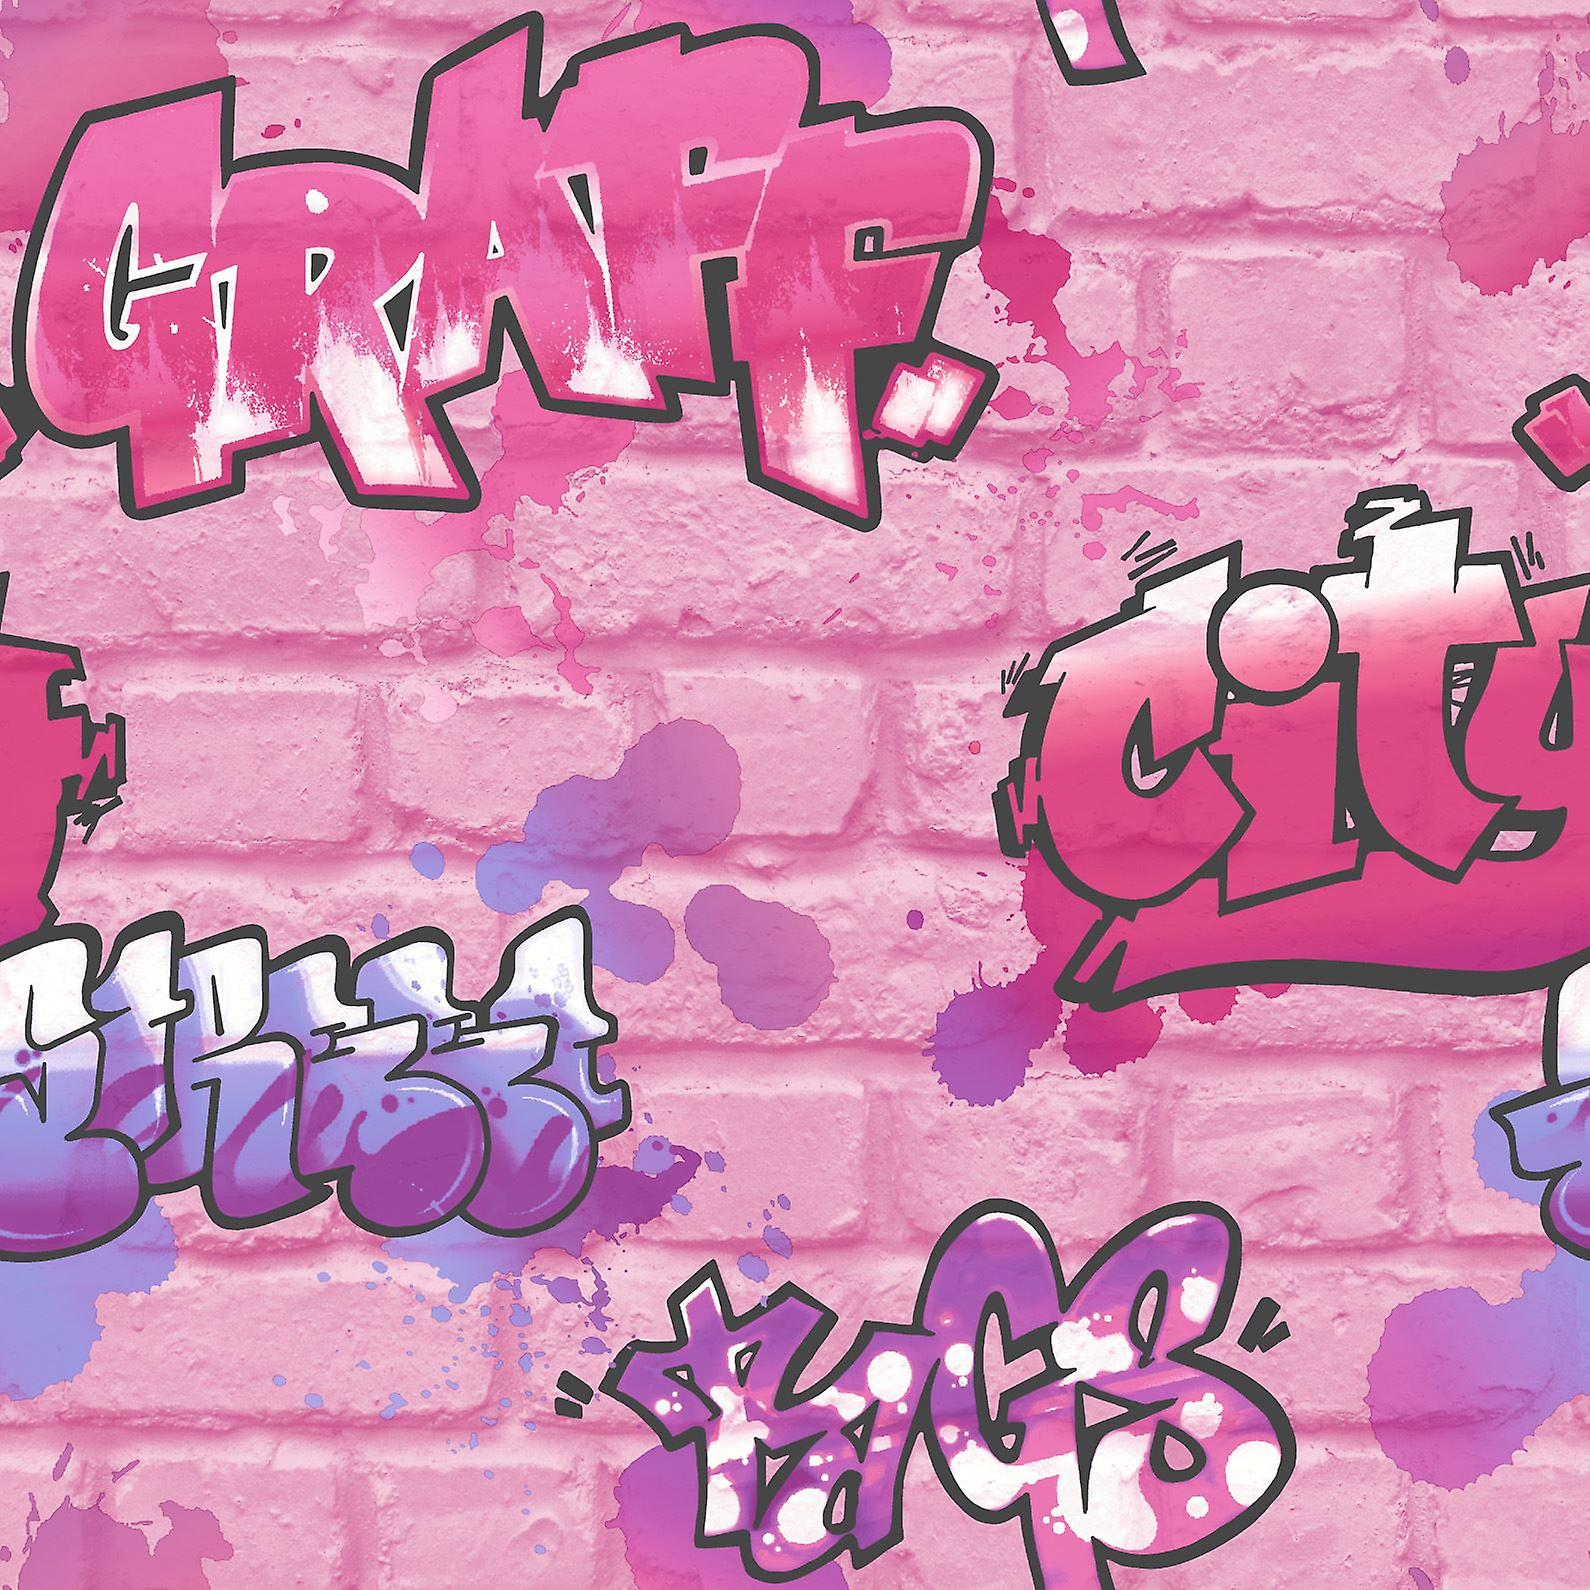 Girls Pink Graffiti Wallpaper Glitter Spray Paint Embossed Childrens Room Urban